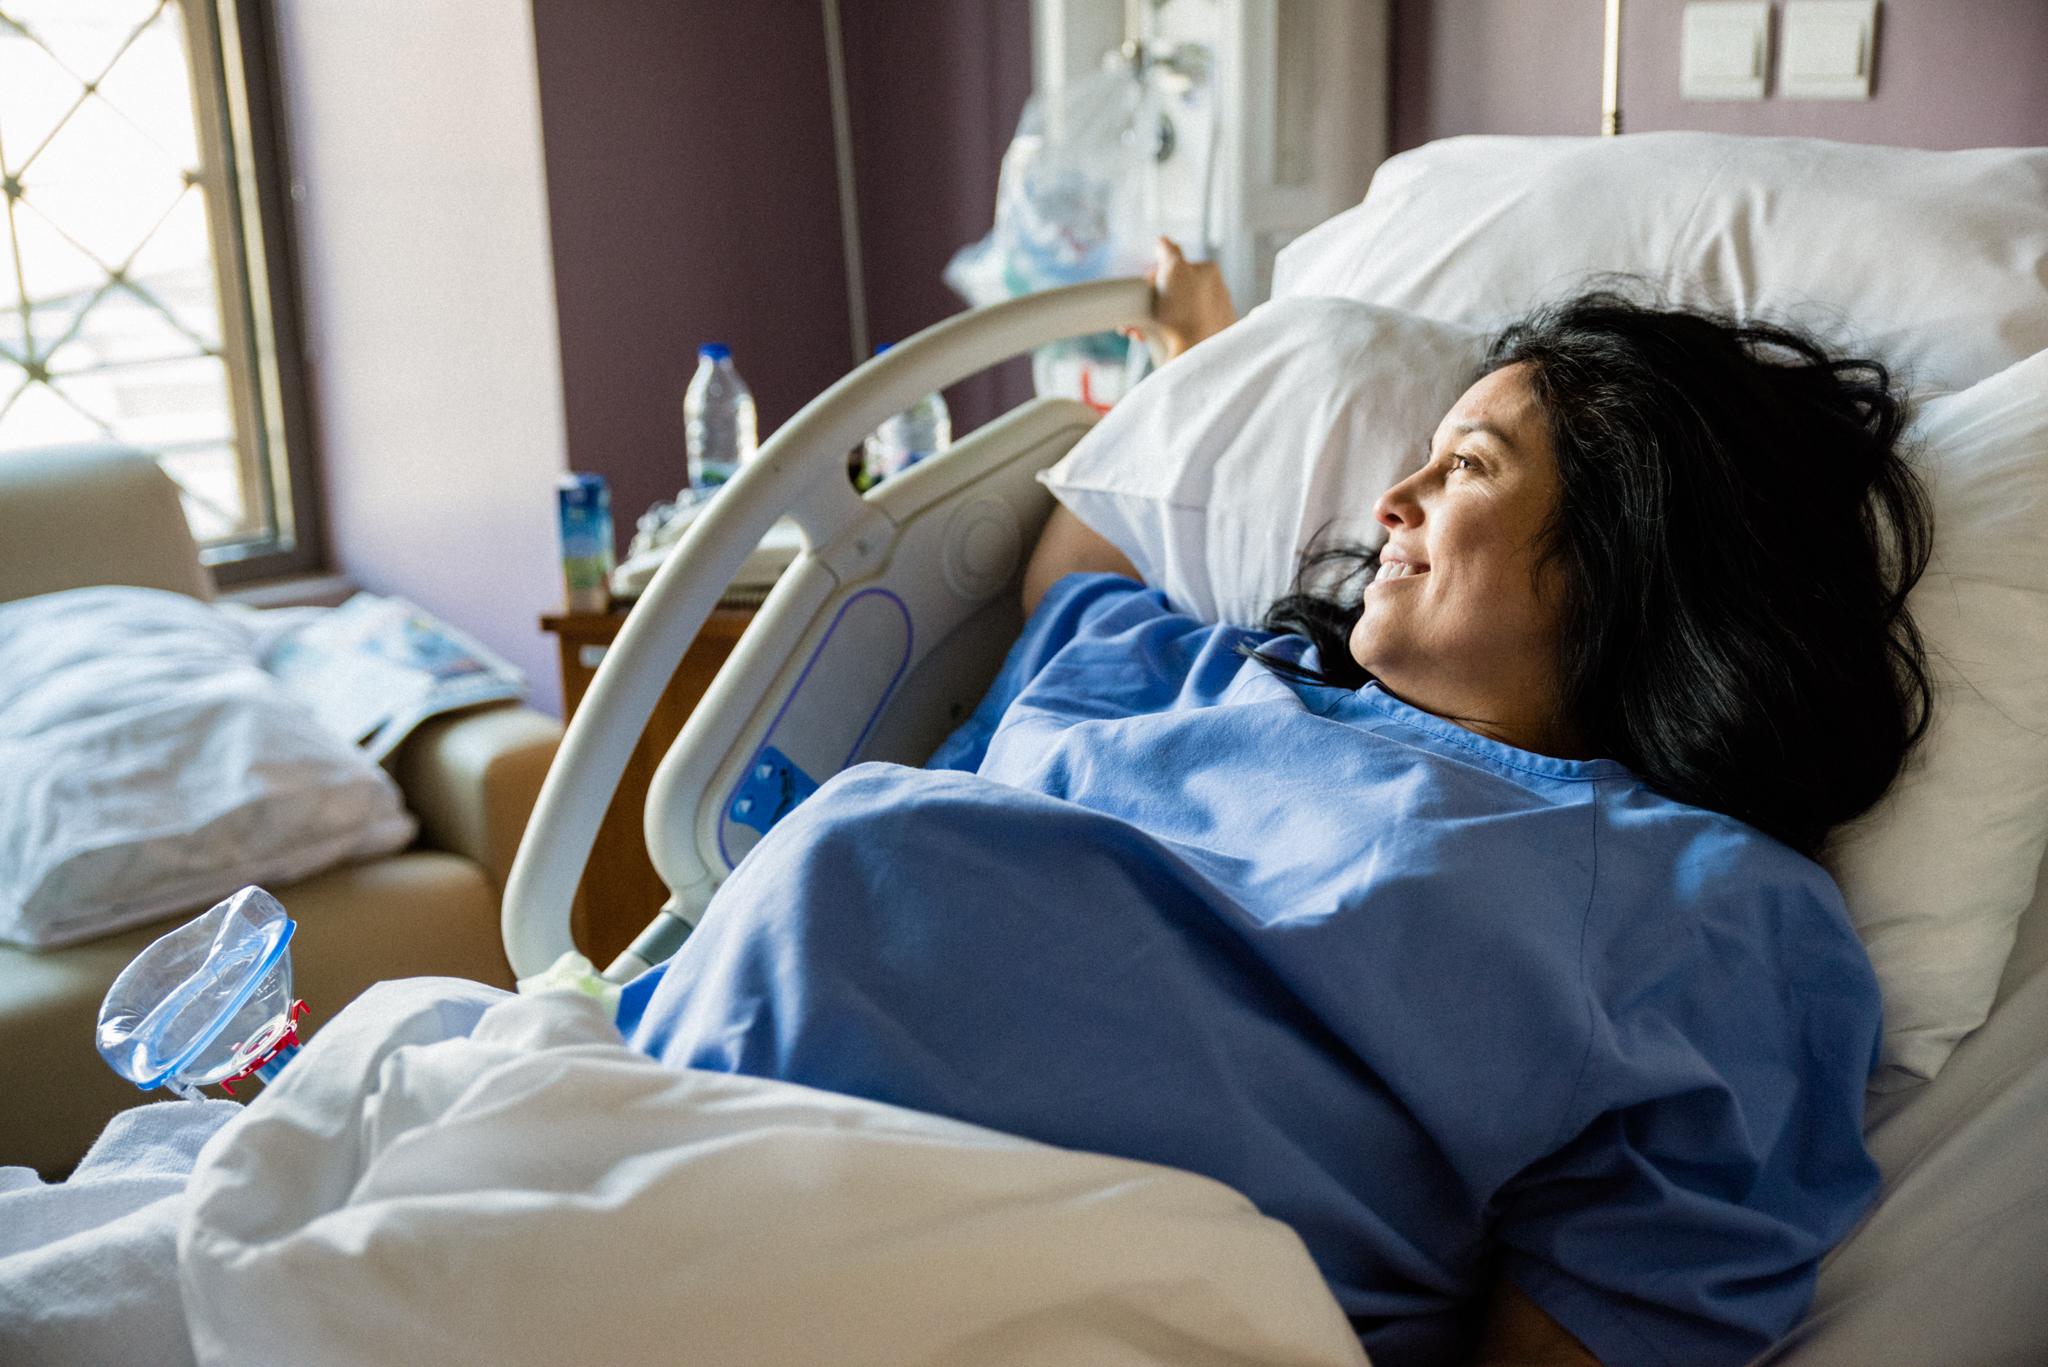 Lana Photographs Dubai Birth Photographer woman resting between contractions during labor inside the labor ward at Dubai Mediclinic City Hospital